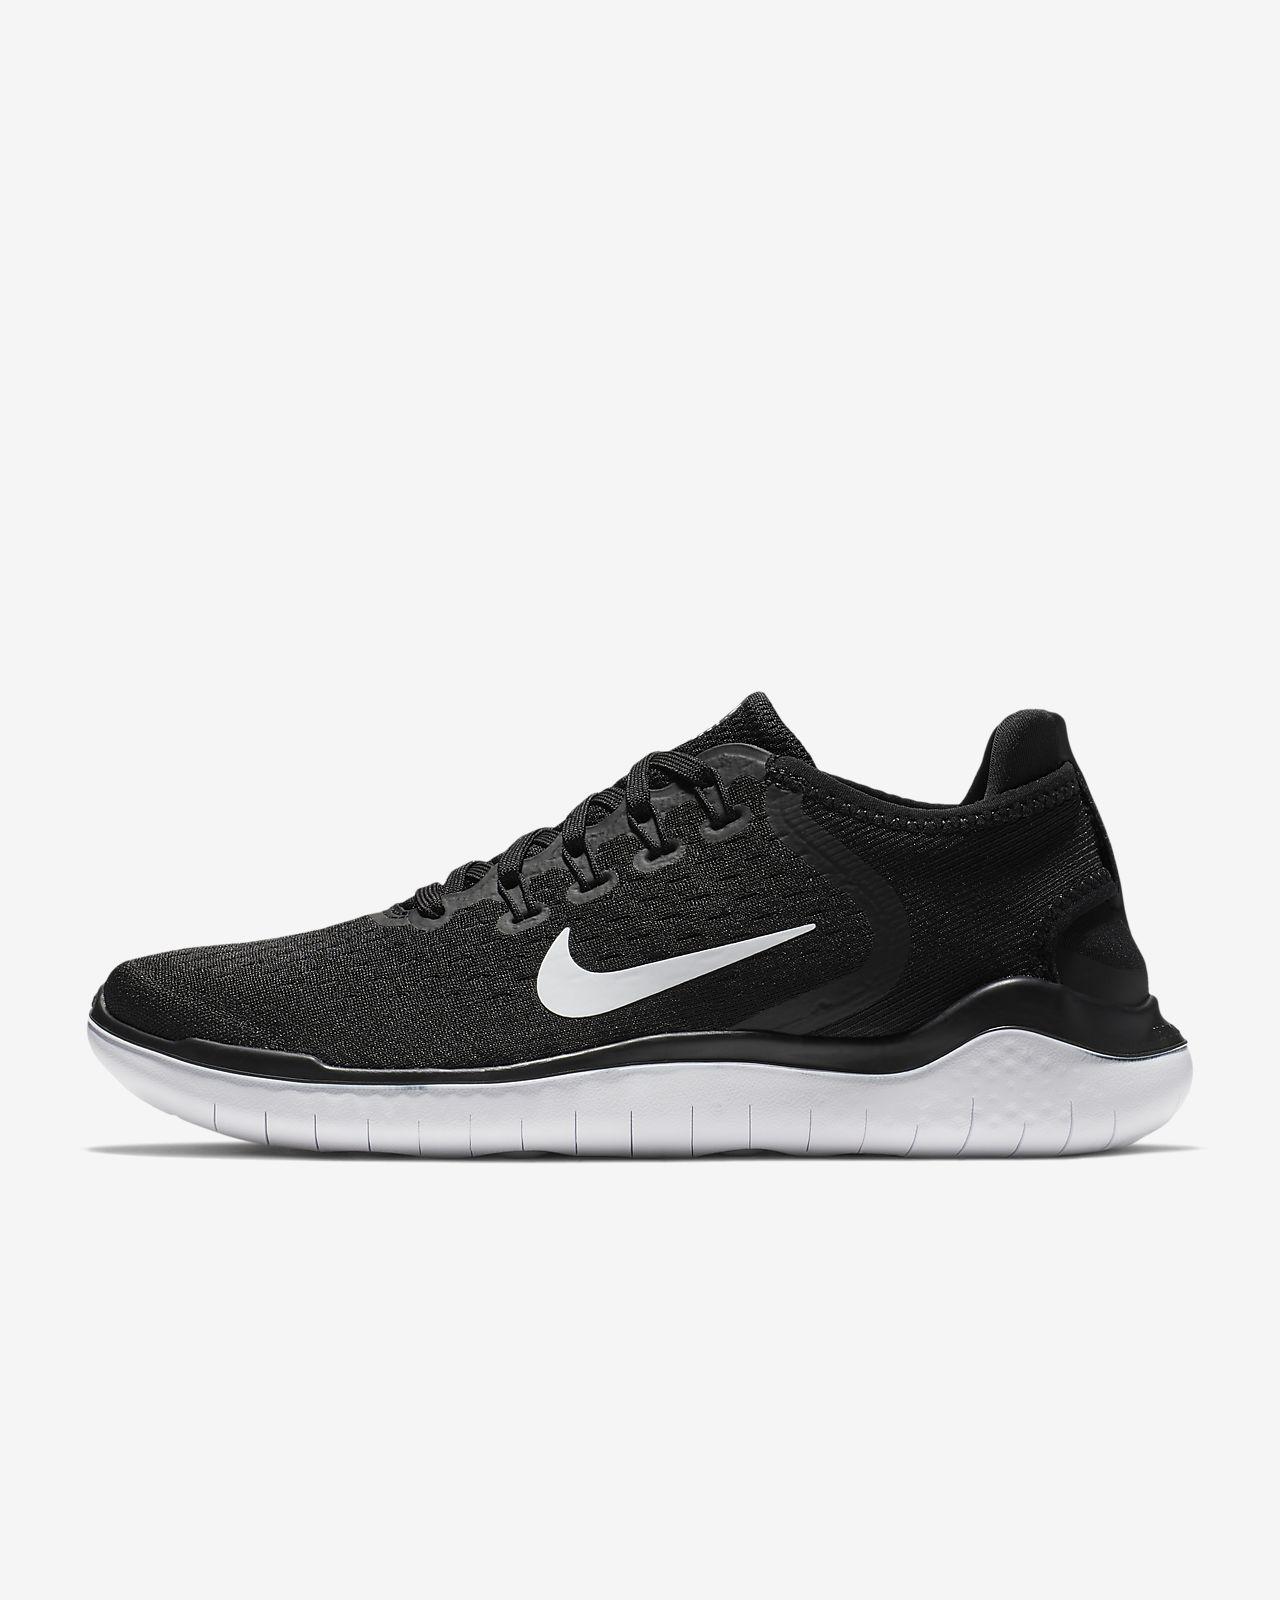 Calzado de running para mujer Nike Free RN 2018